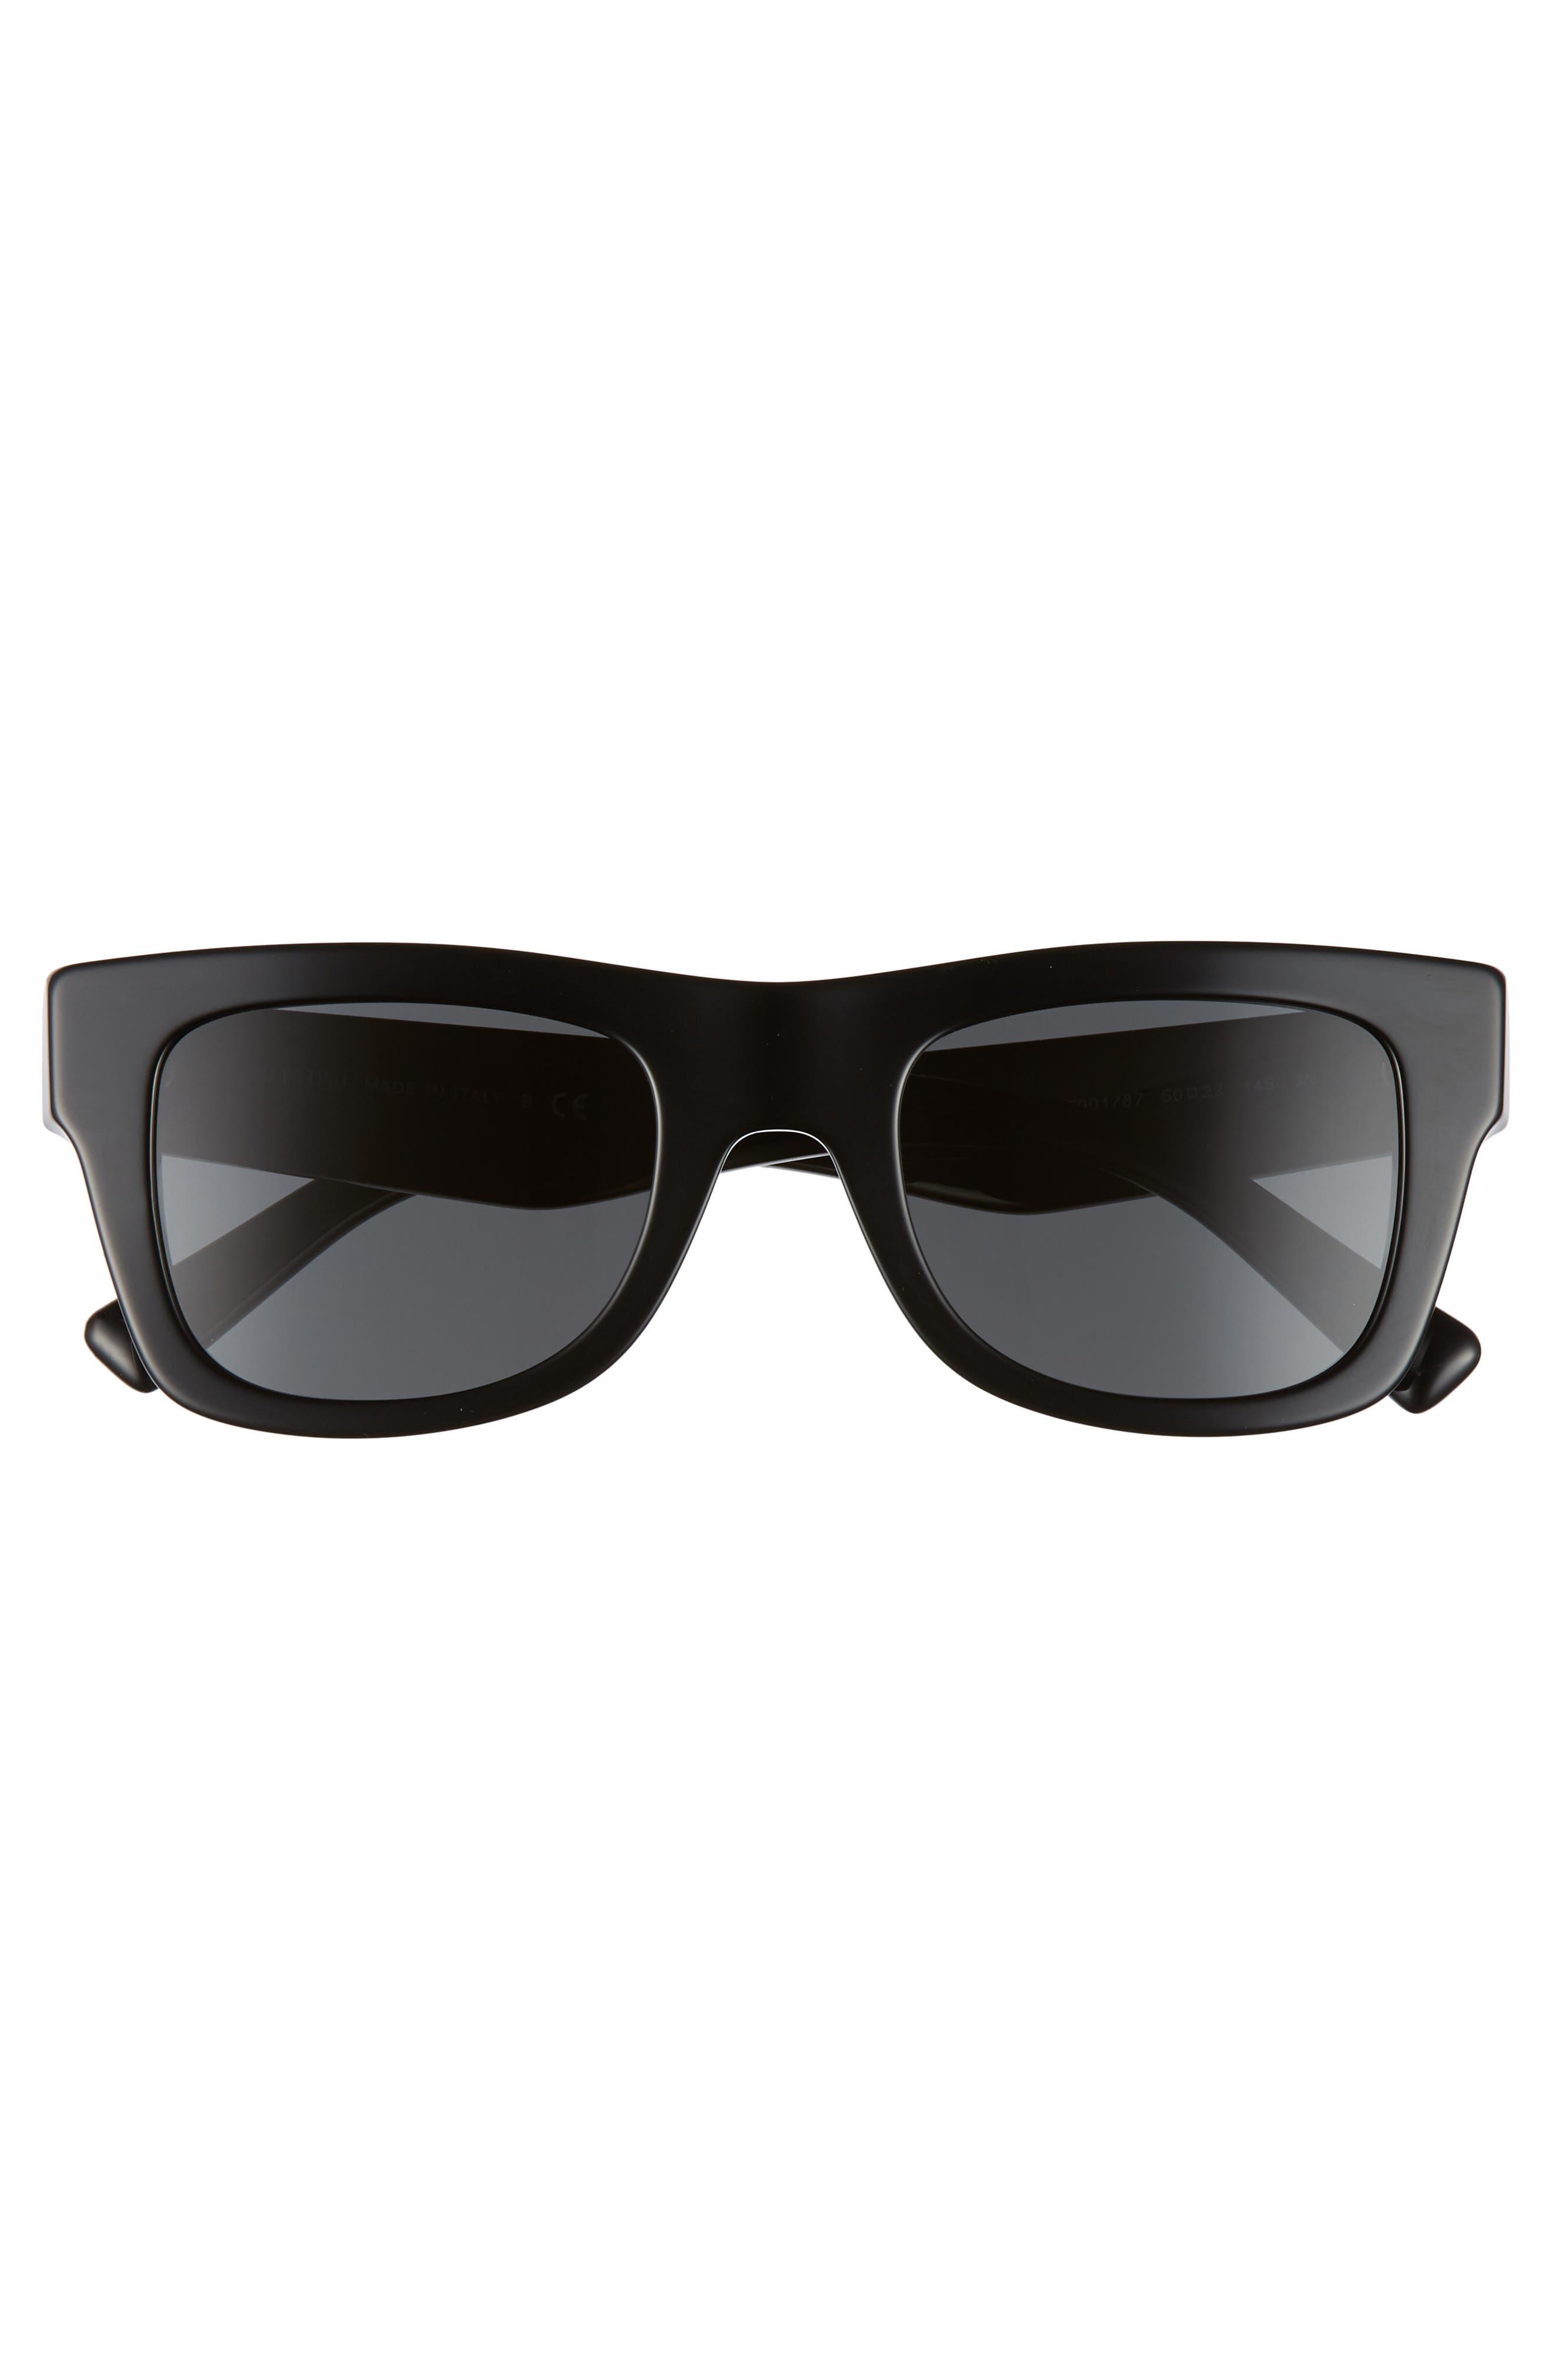 VALENTINO, VLTN 50mm Square Sunglasses, Alternate thumbnail 3, color, BLACK SOLID